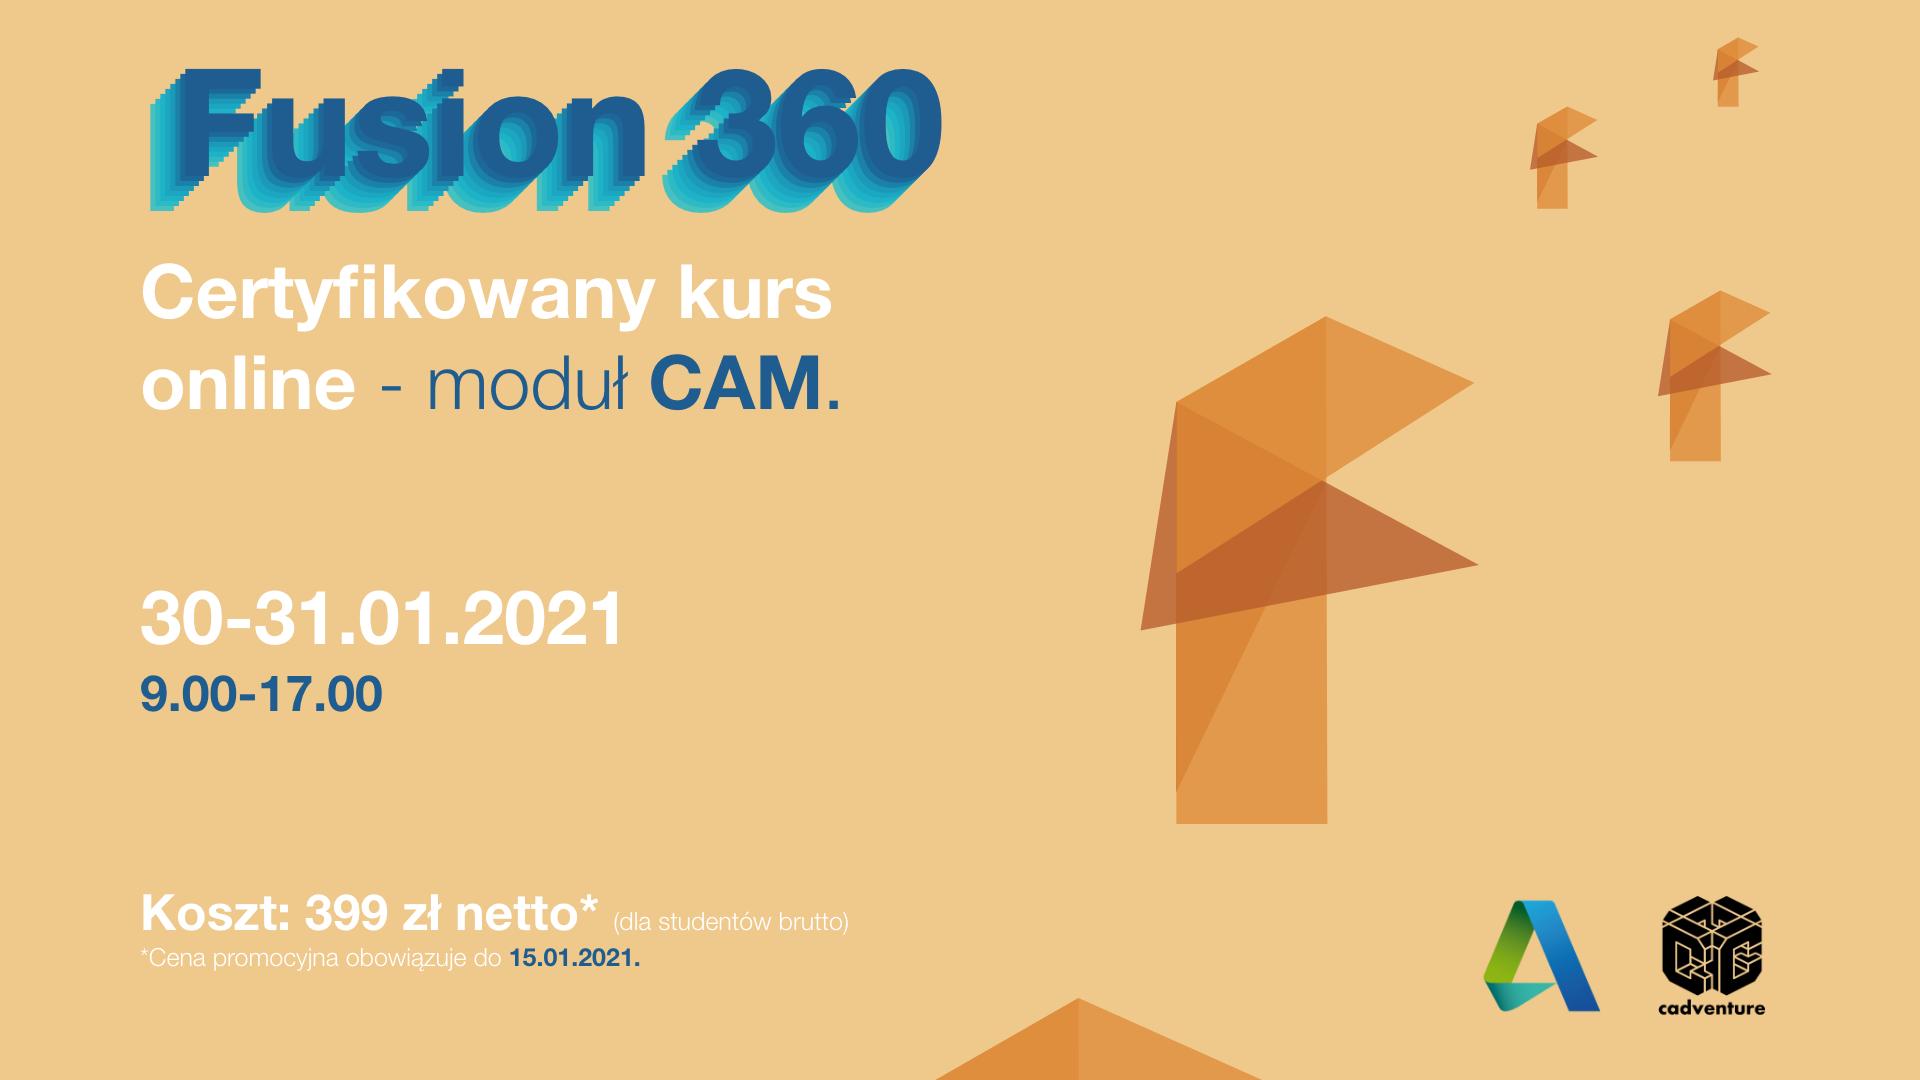 Fusion360 30-31.01.2021